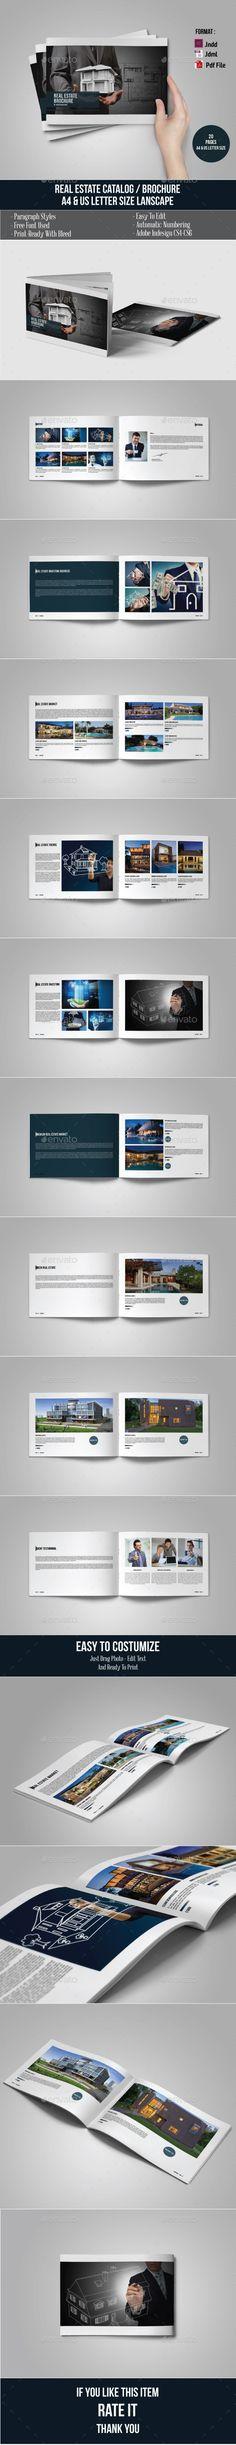 Real Estate Brochure/Catalog Template #design #broschüre Download: http://graphicriver.net/item/real-estate-brochurecatalog/12504995?ref=ksioks